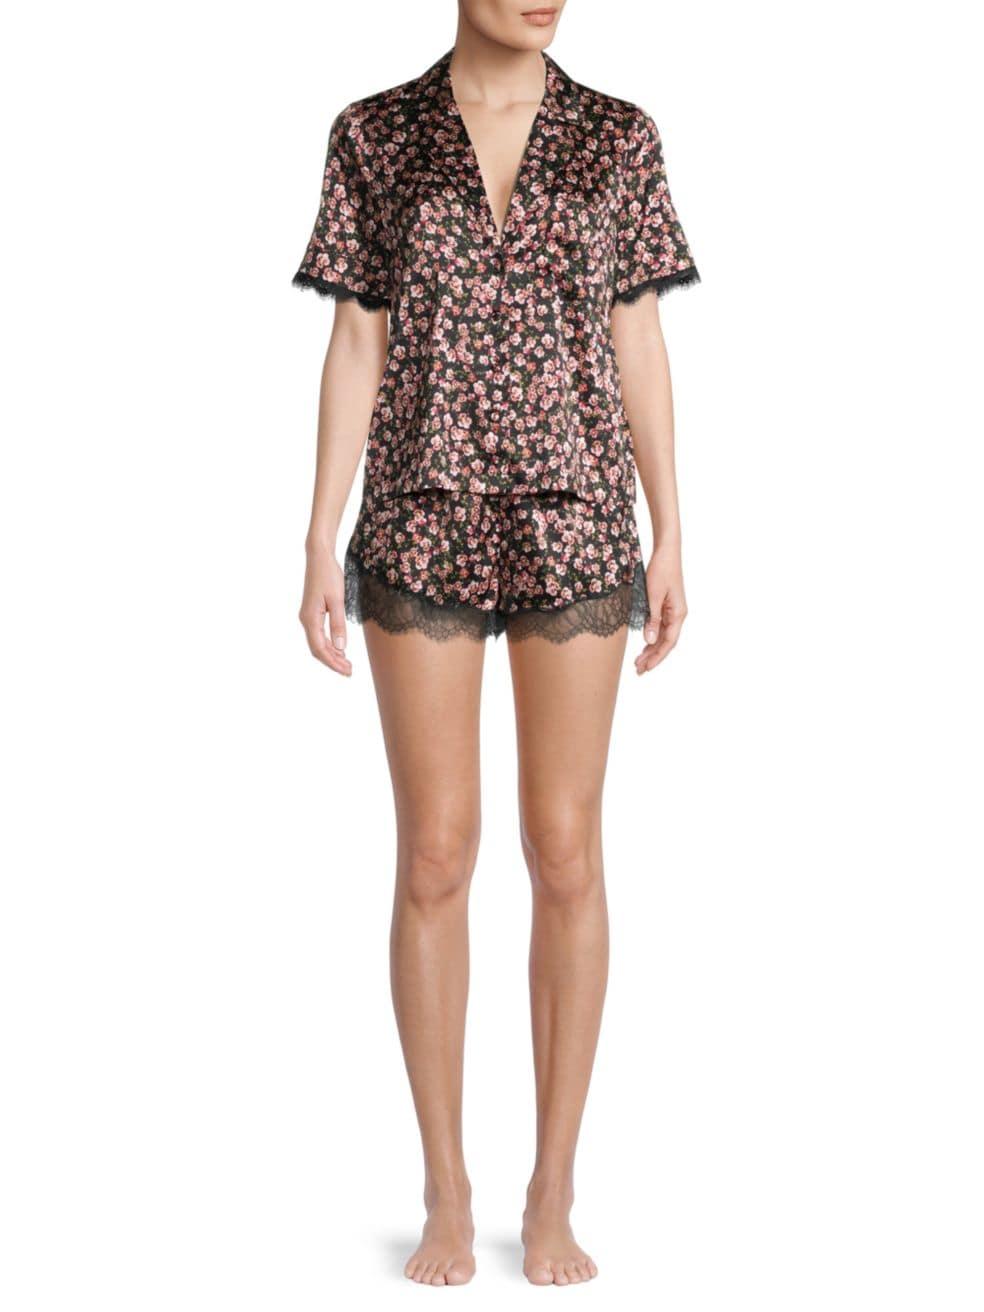 Cami NYC 2-Piece Silk Leopard-Print Lace Pajama Set | SaksFifthAvenue